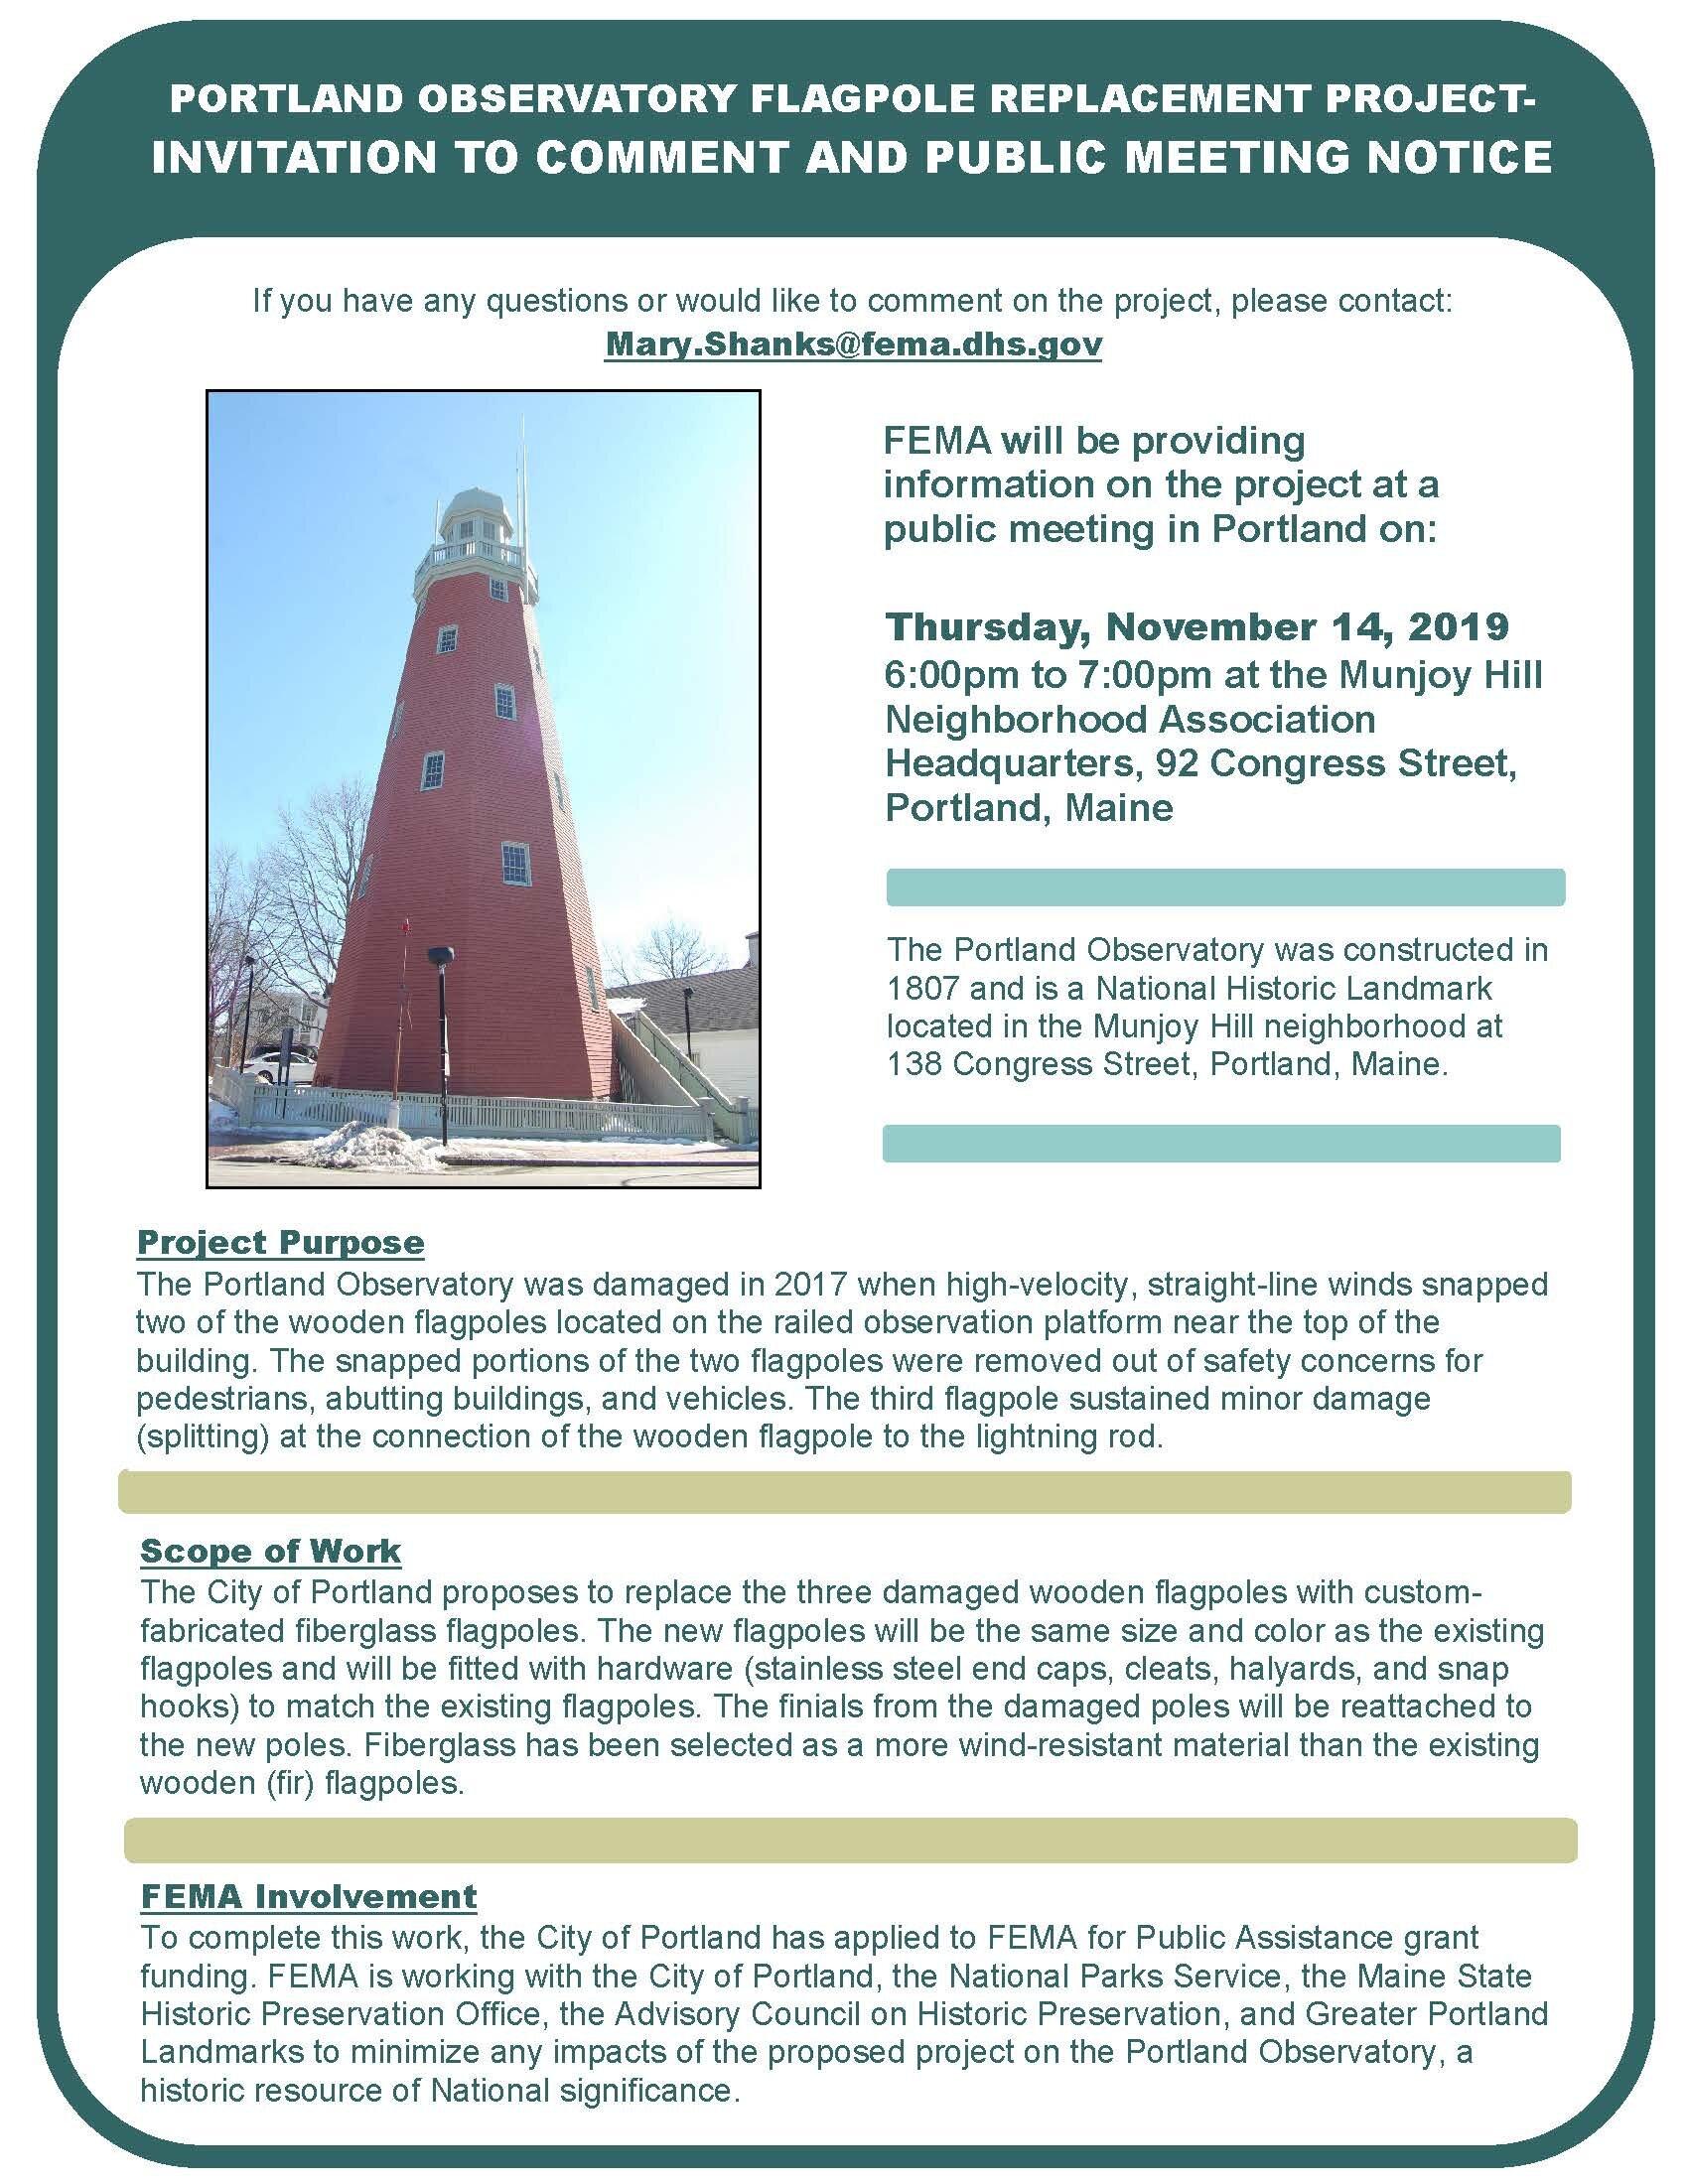 Public Meeting Handout-Website Notice_jpg.jpg